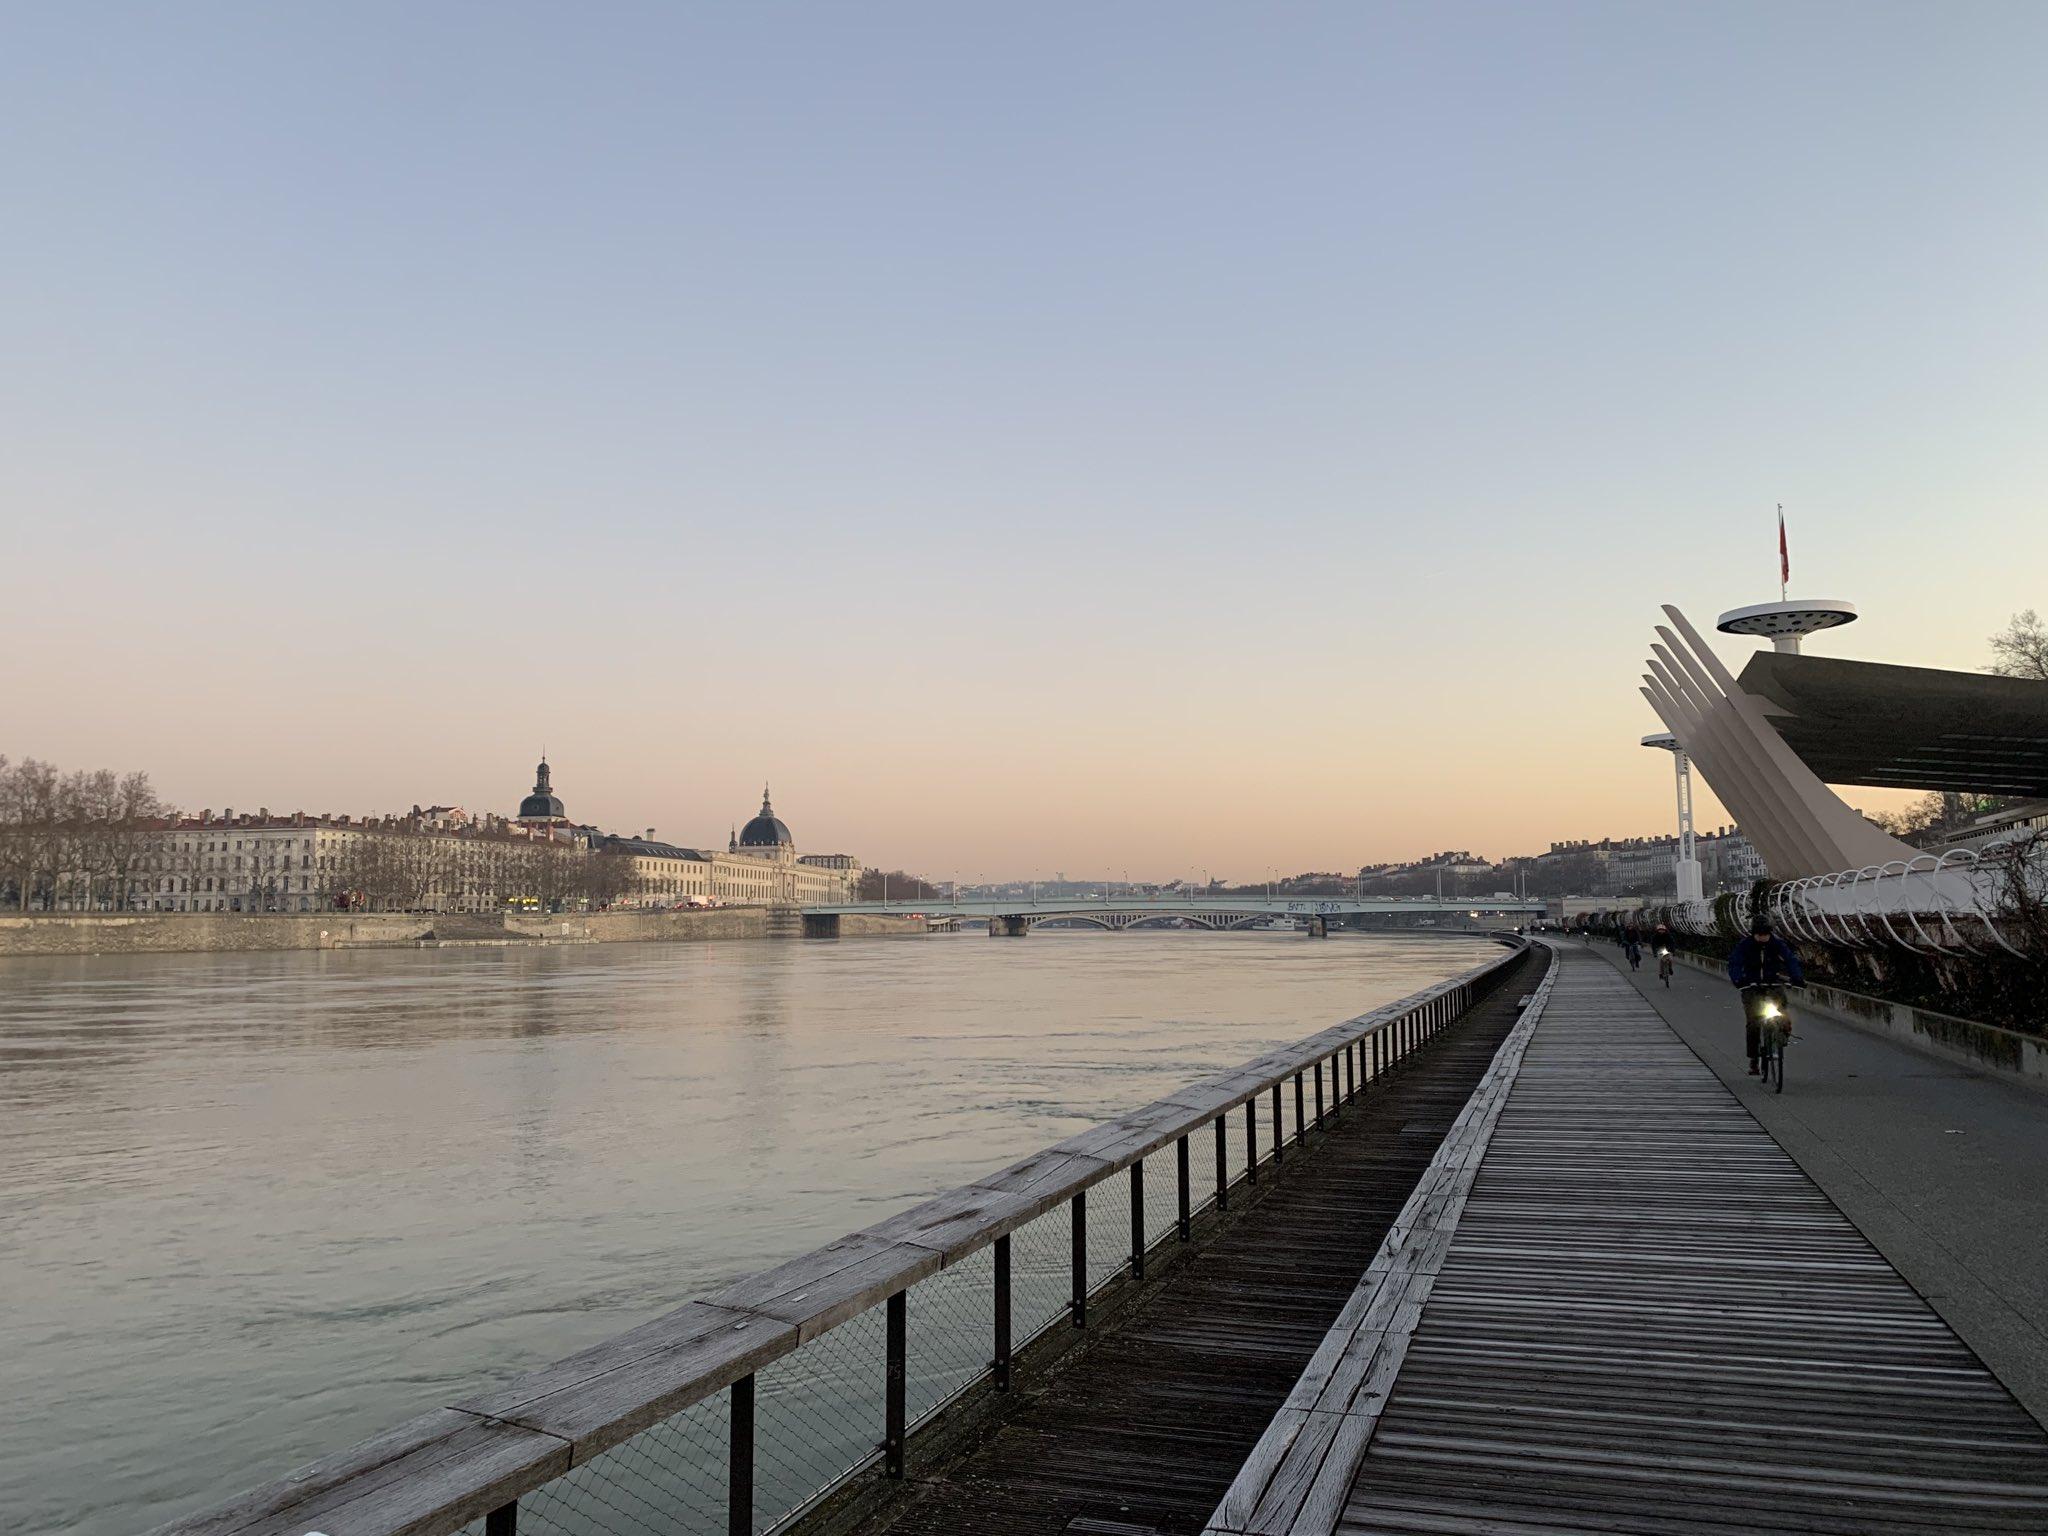 Berges du Rhône à Lyon